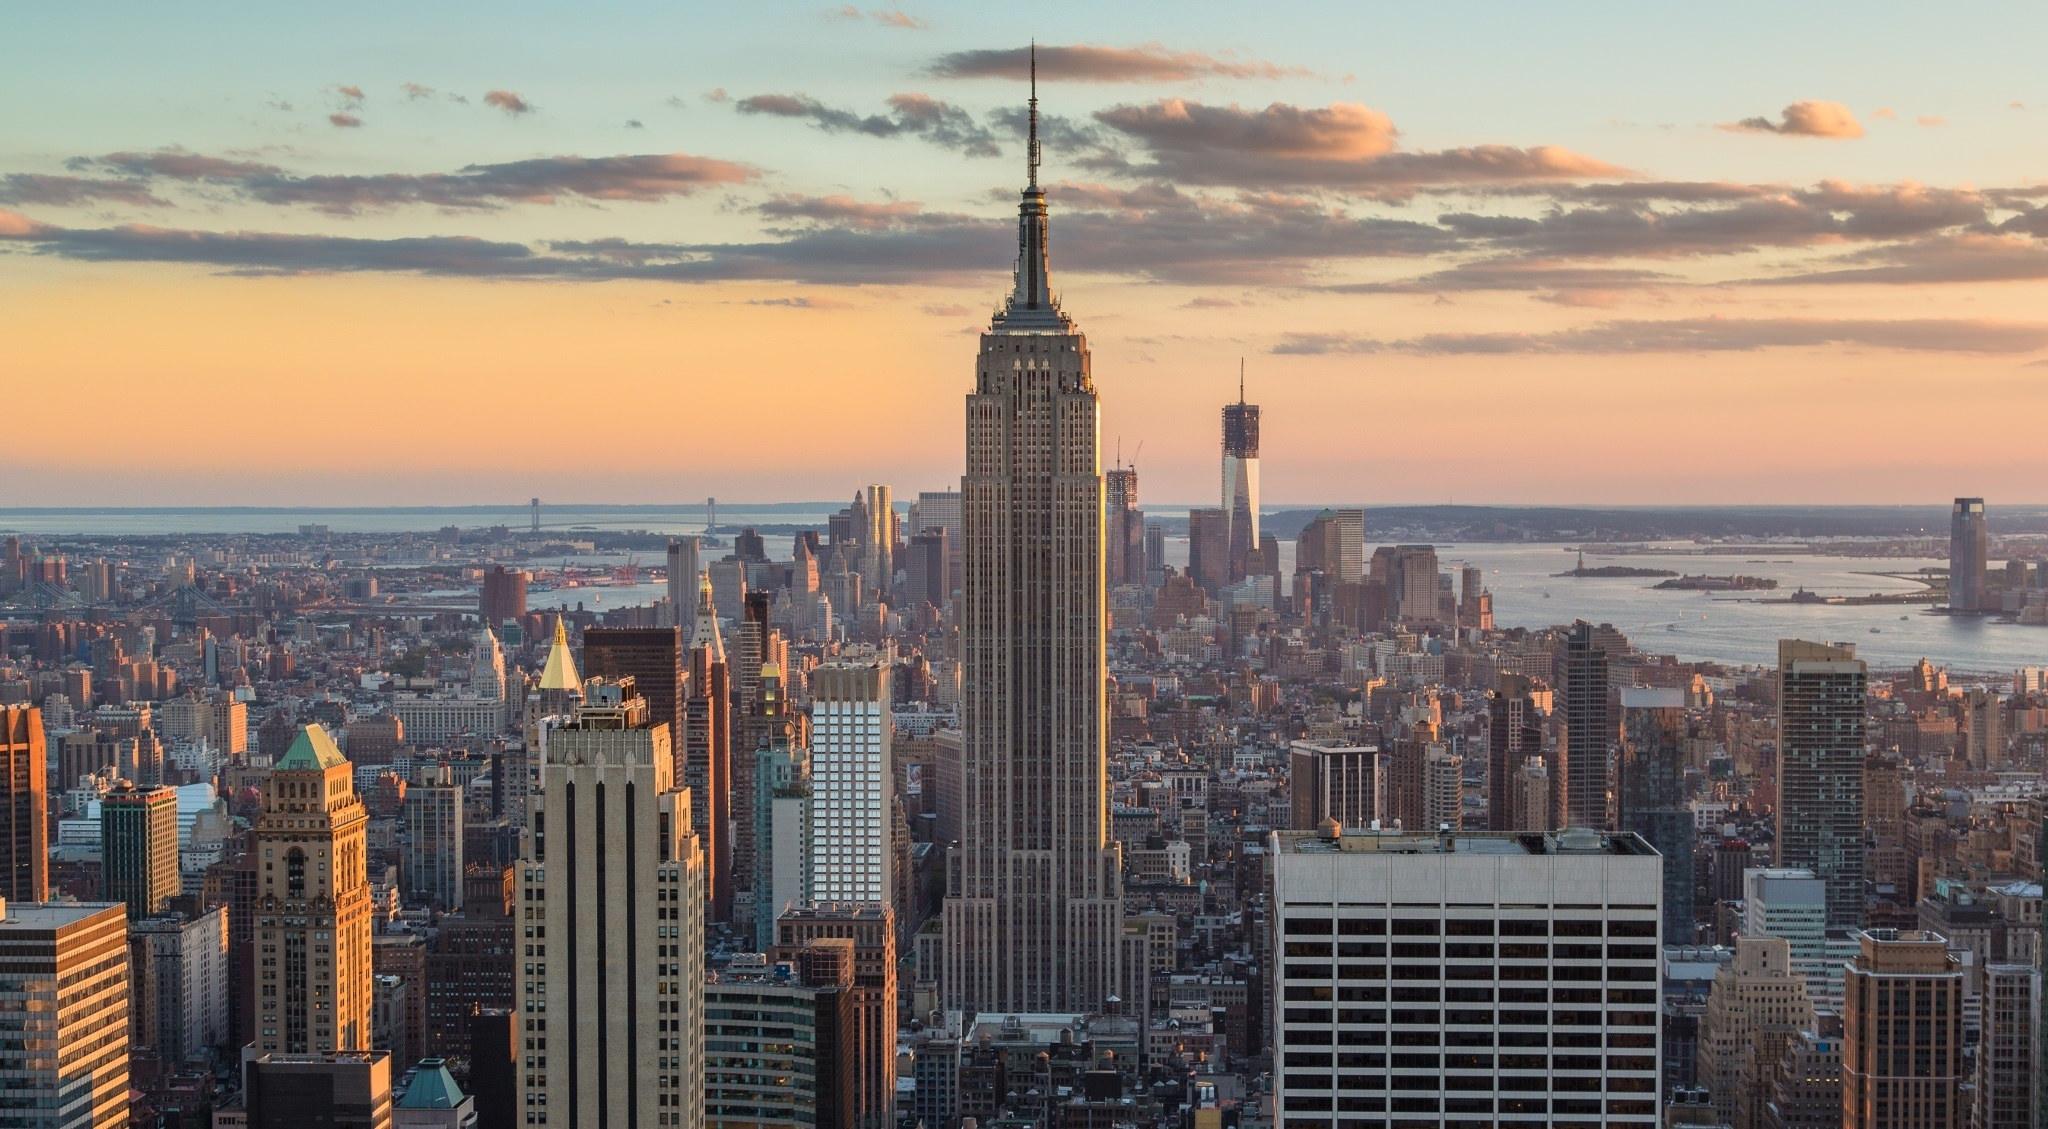 Empire State Building   © Sam valadi/Flickr